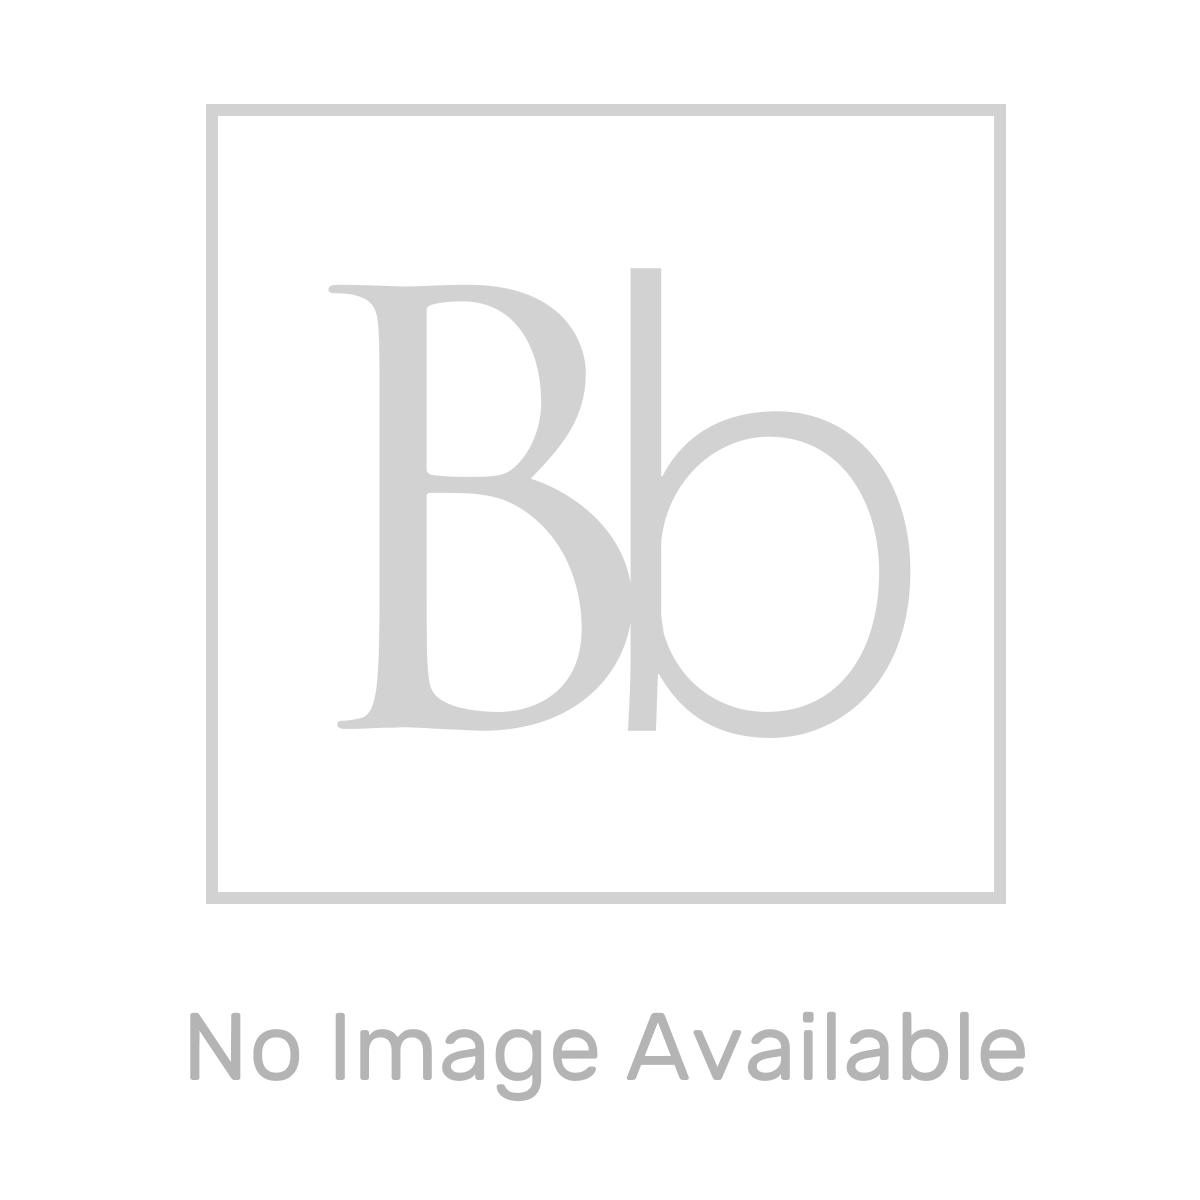 Zenith Form Wall Mounted Bath Shower Mixer Tap